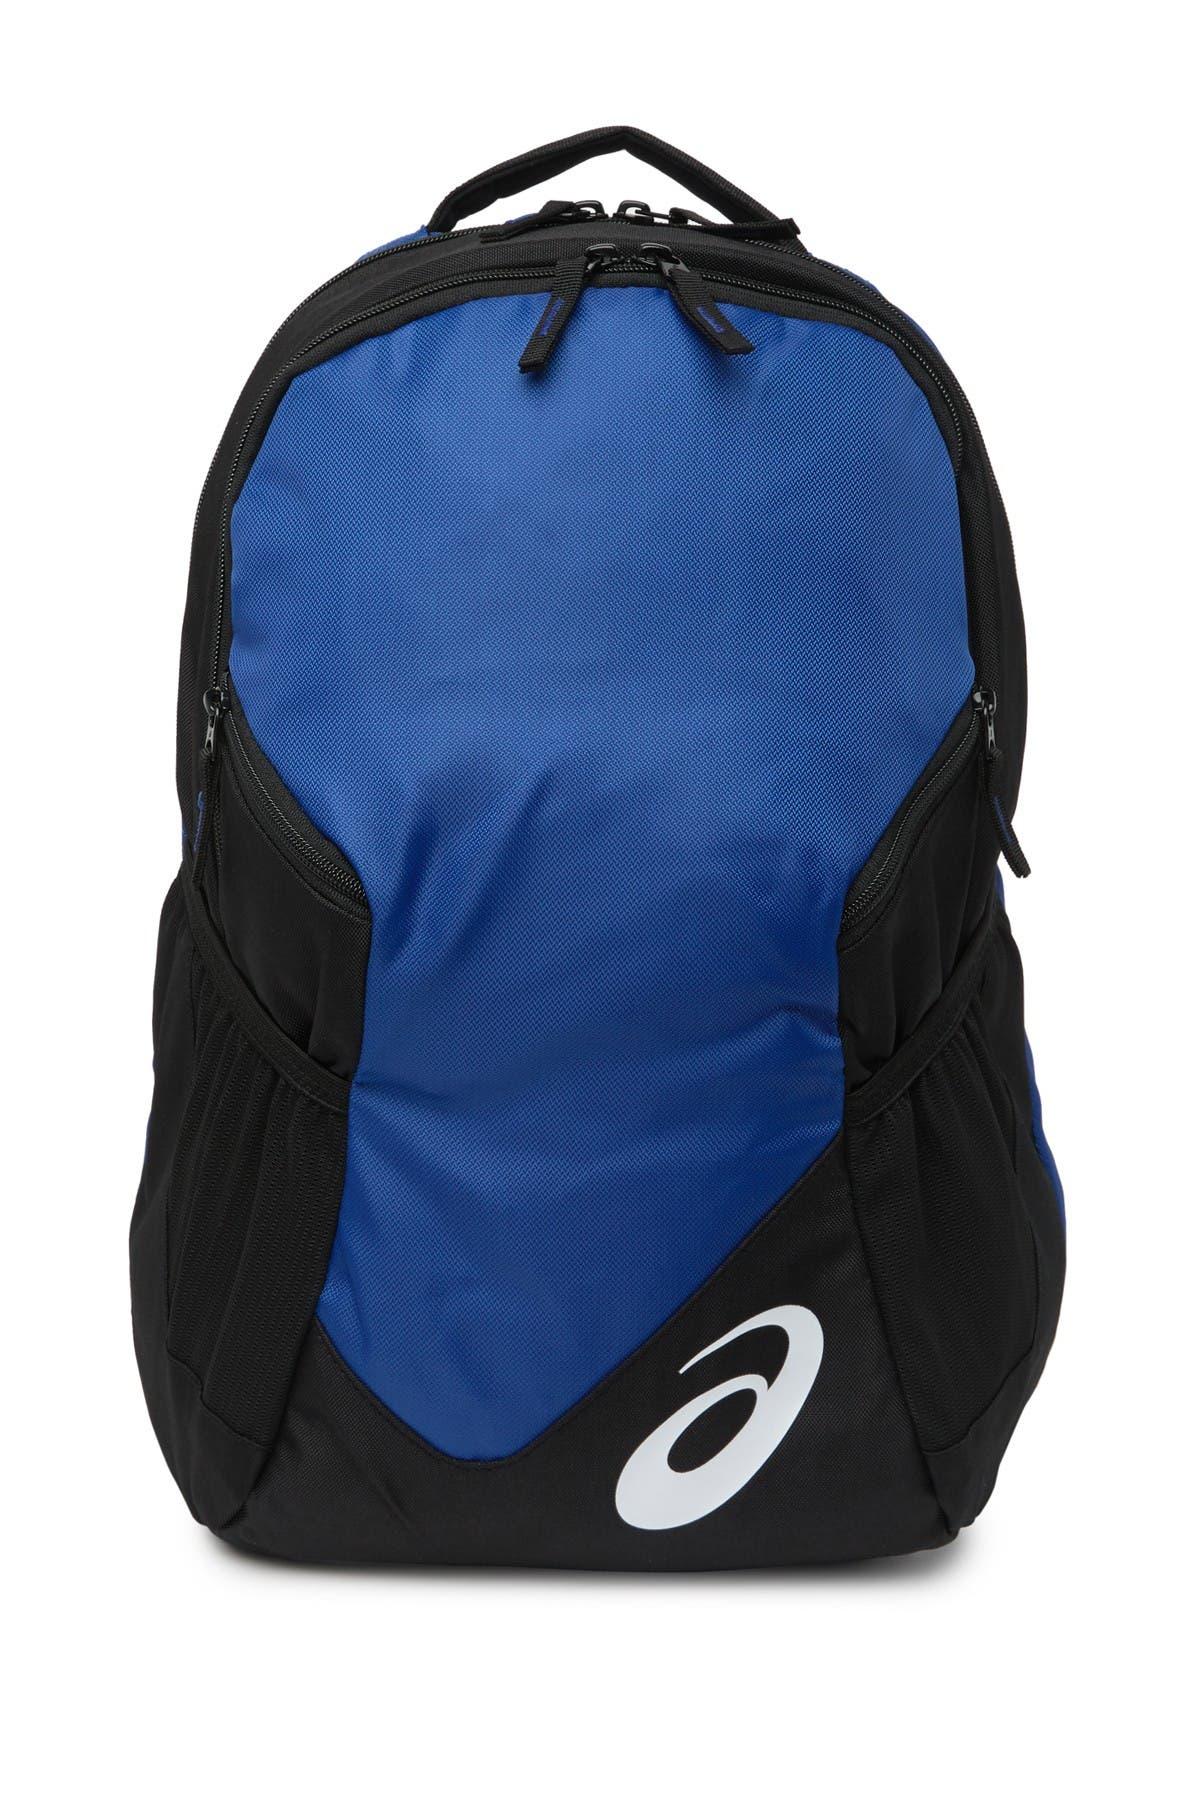 Image of ASICS Edge II Backpack